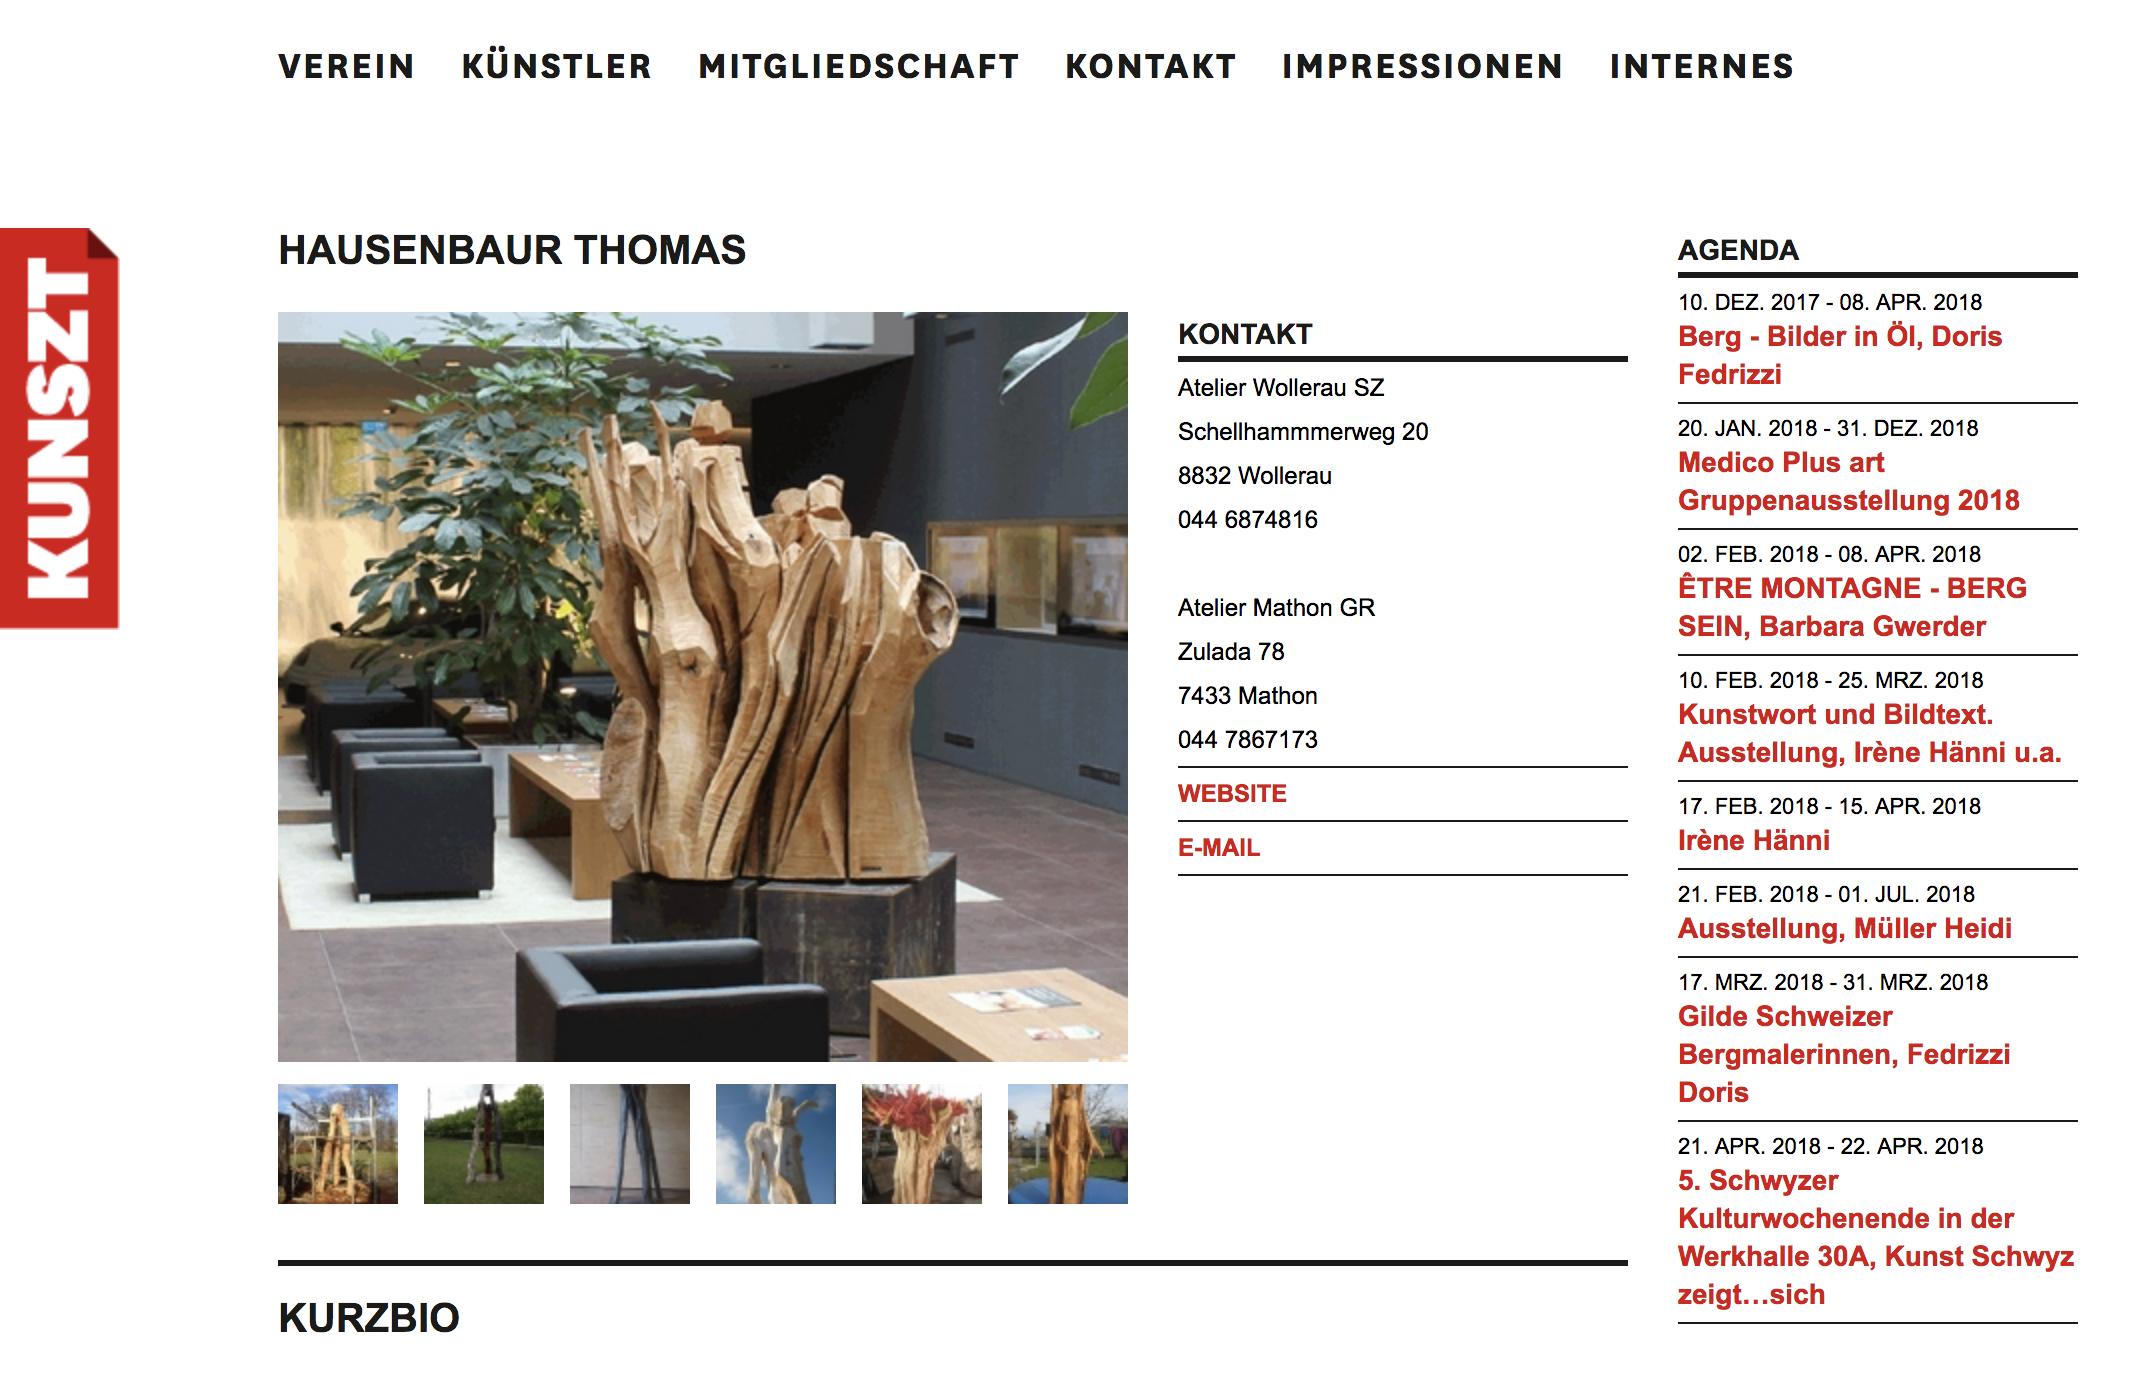 Thomas Hausenbaur - Kunst Schwyz